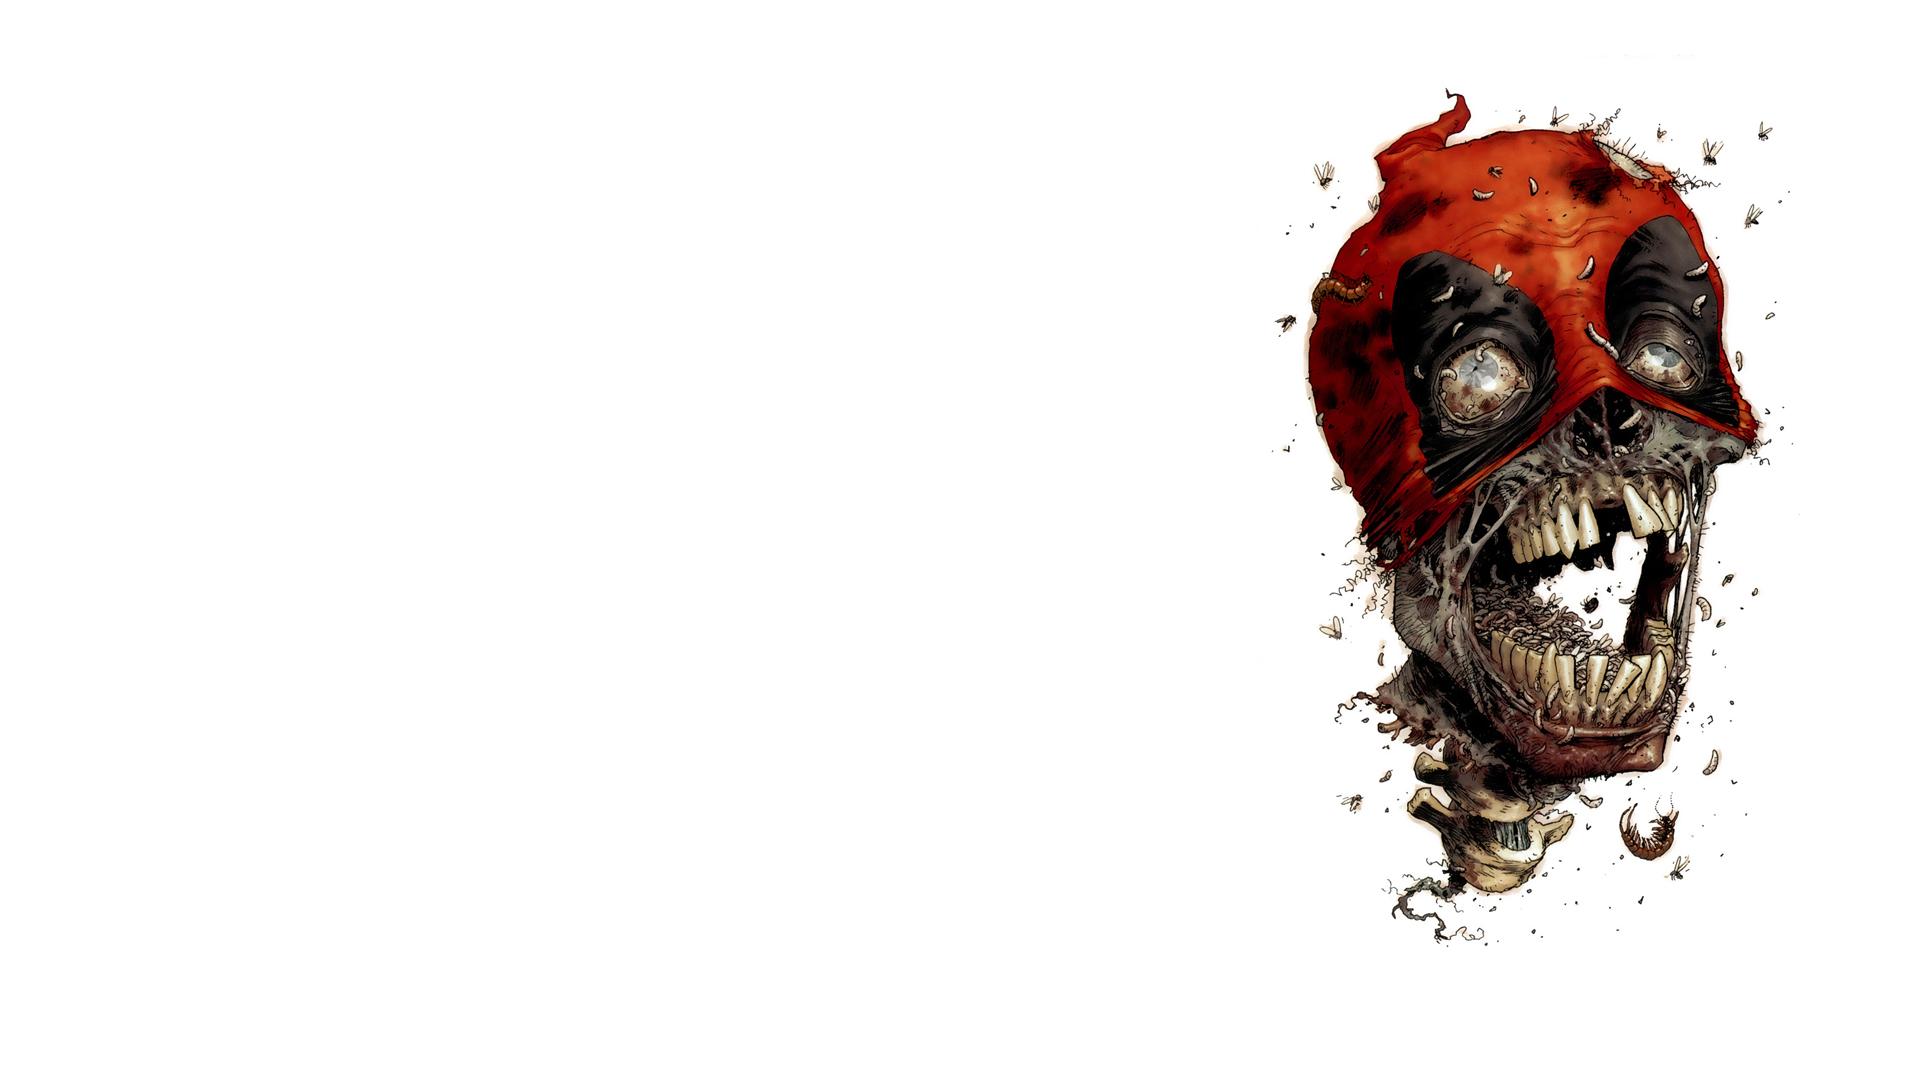 Deadpool Wade Winston Wilson Anti Hero Marvel Comics Mercenary